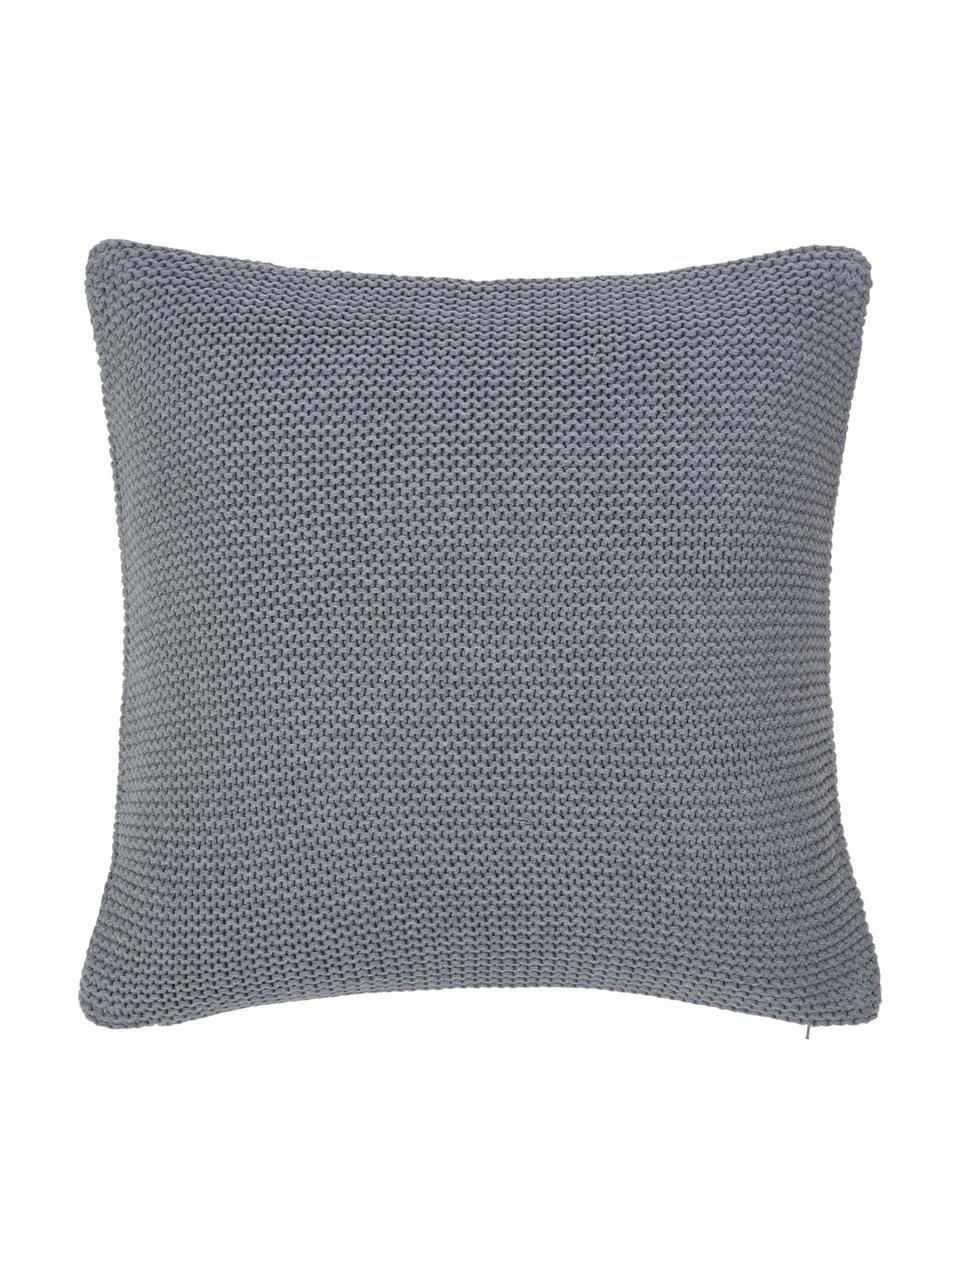 Strick-Kissenhülle Adalyn aus Bio-Baumwolle in Grau, 100% Bio-Baumwolle, GOTS-zertifiziert, Grau, 60 x 60 cm